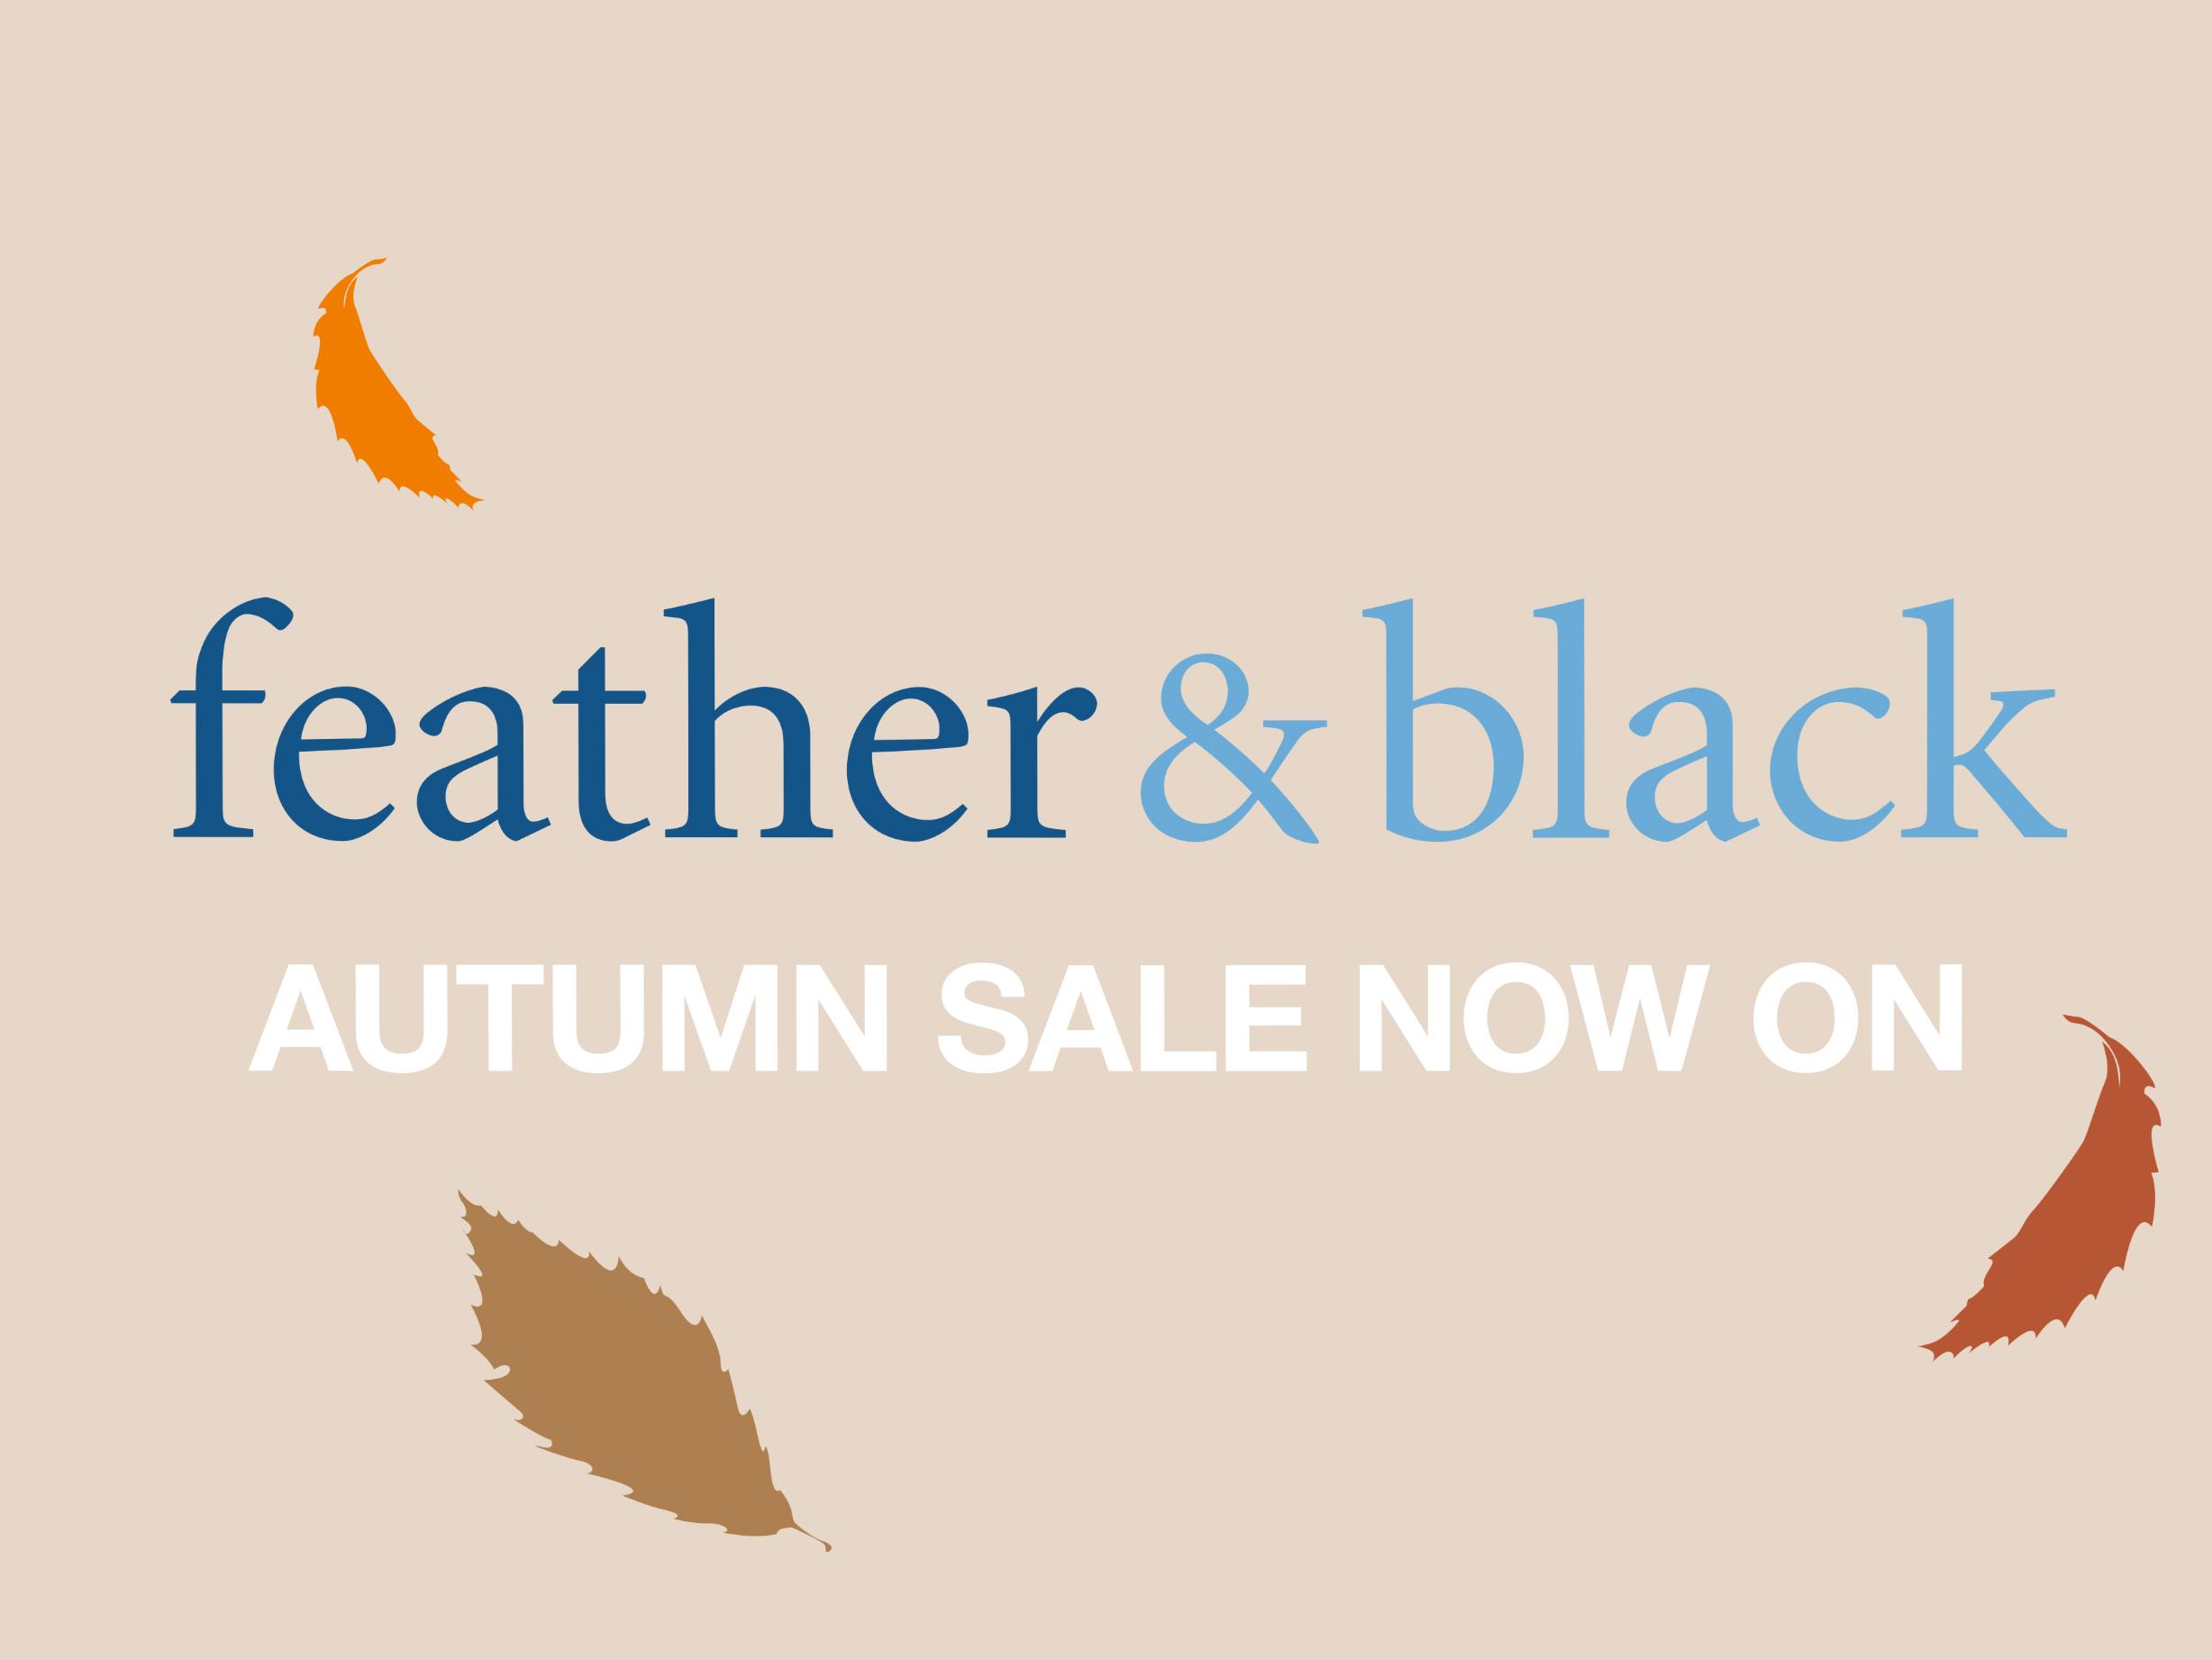 Feather & Black Autumn Sale Campaign